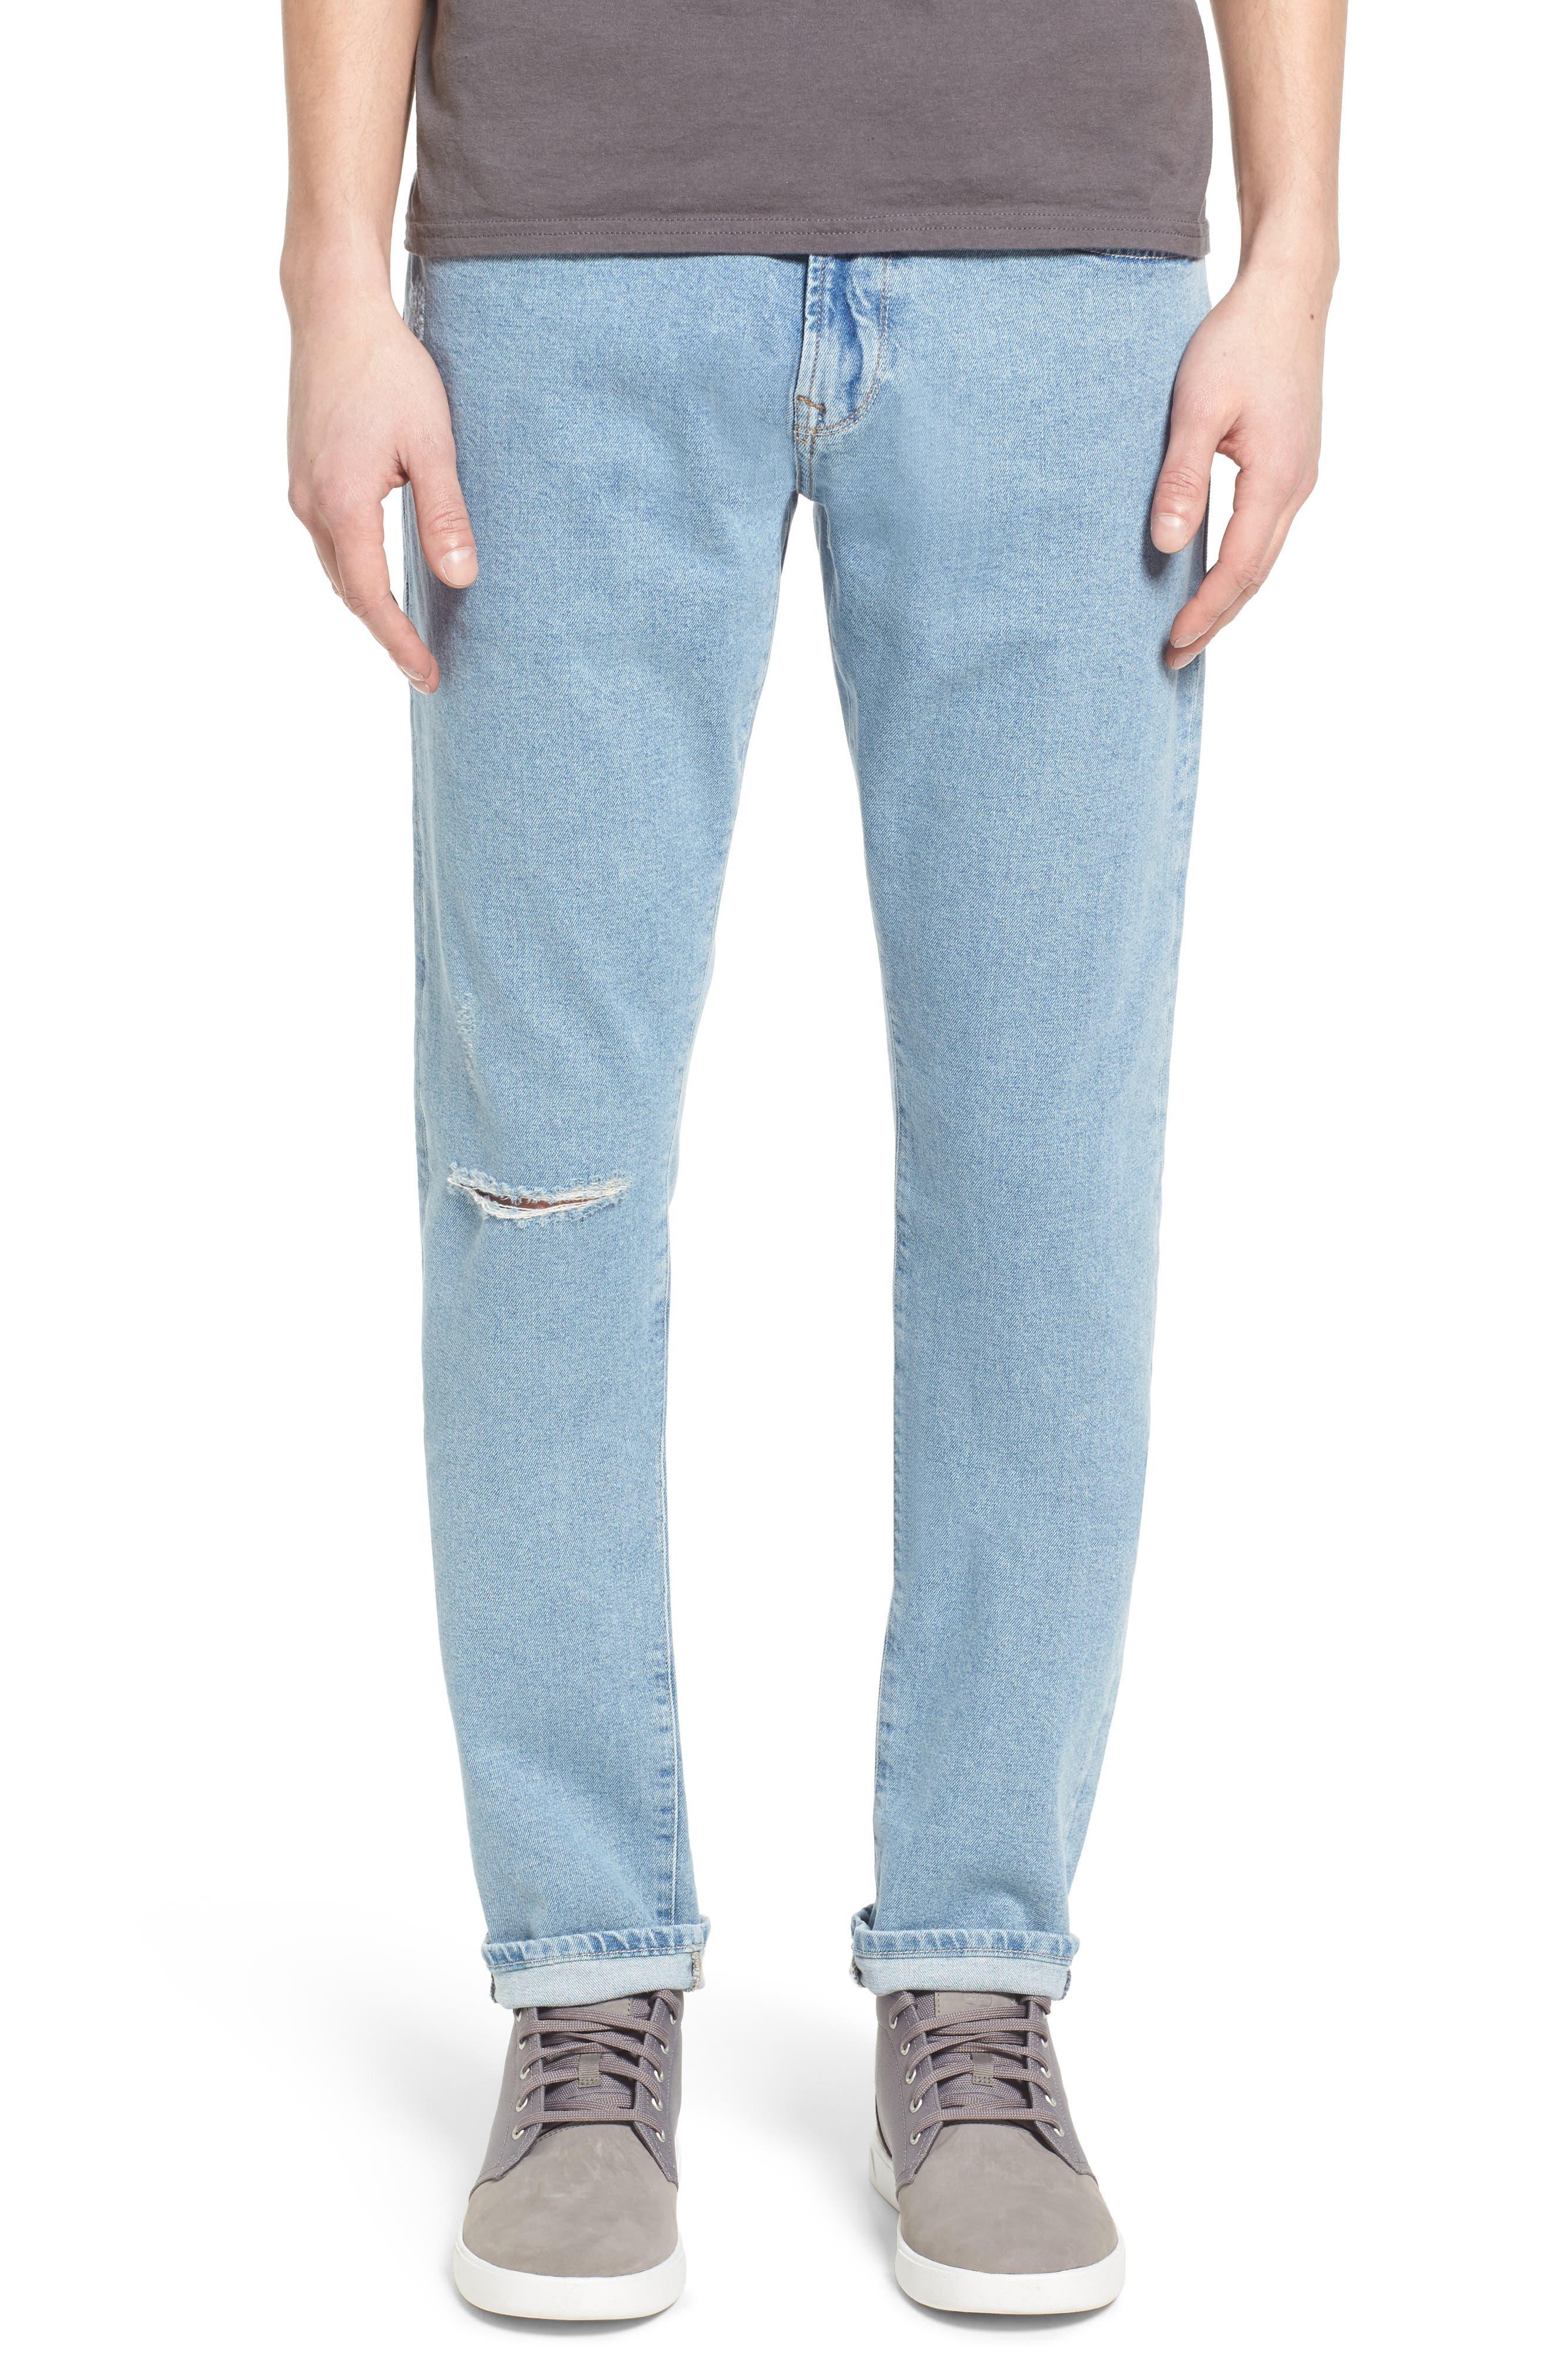 Mavi Jeans Skinny Fit Jeans (Retro Ripped)